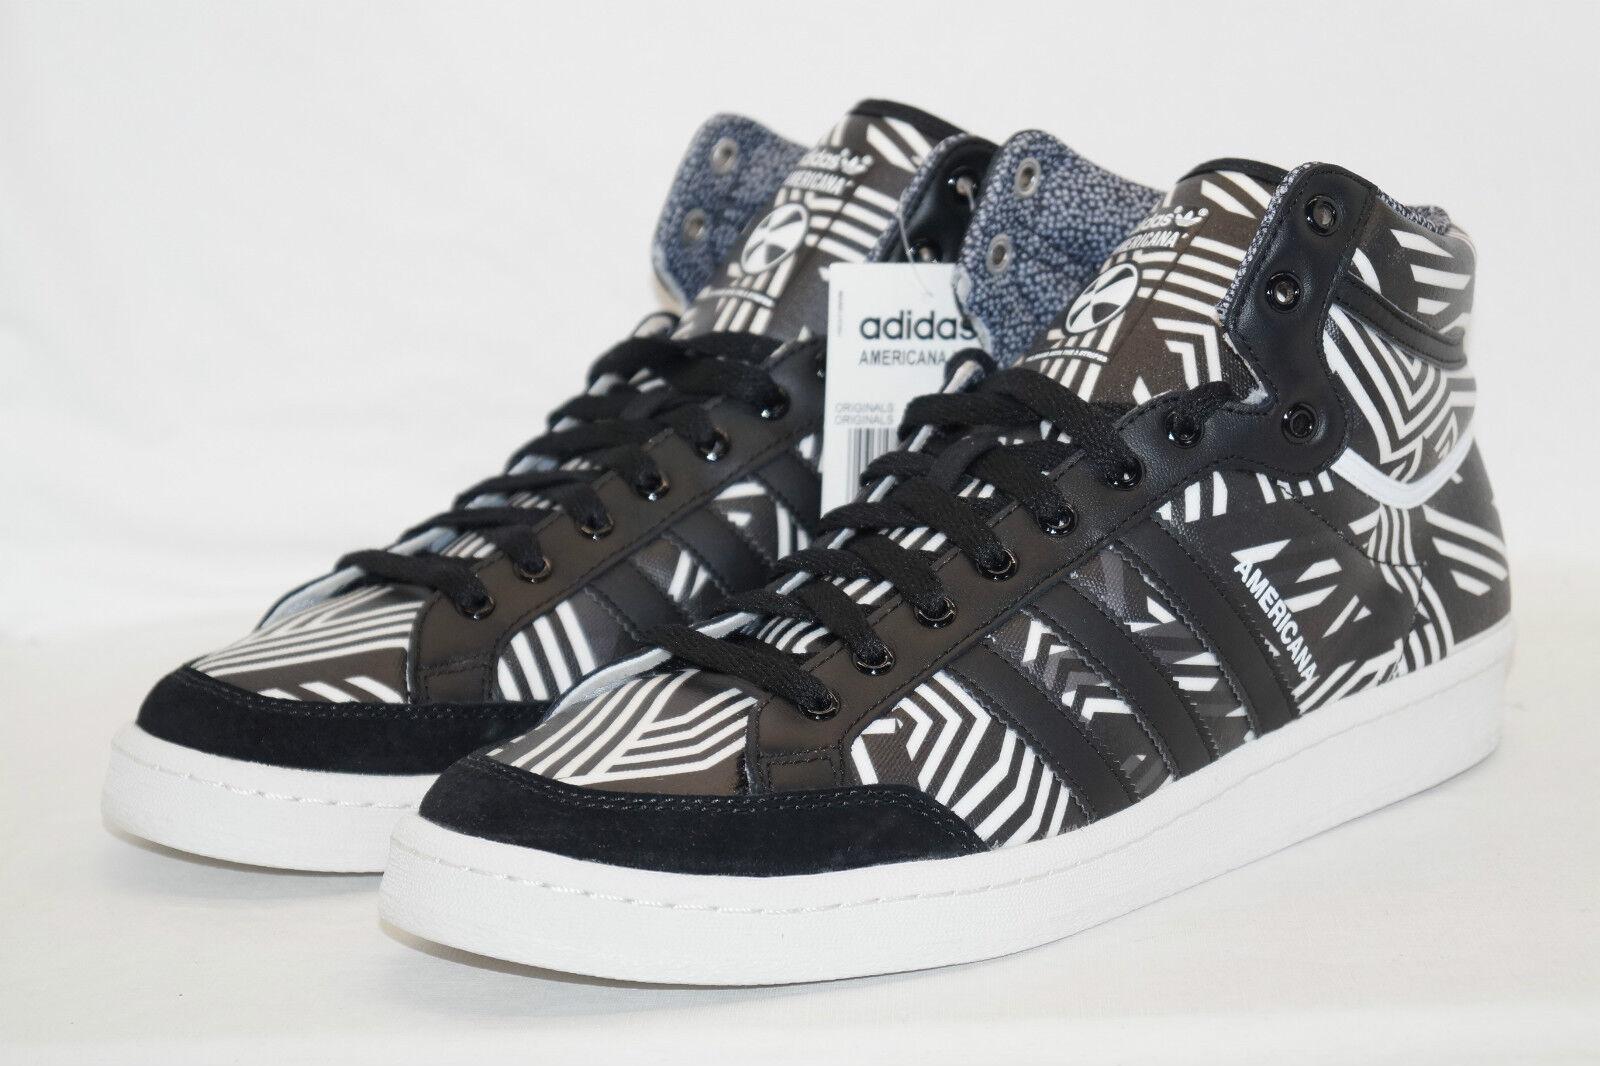 Adidas originals AMERICANA HI 88 Gr.40 2 3 UK 7 black weiss Basketball B-Ball